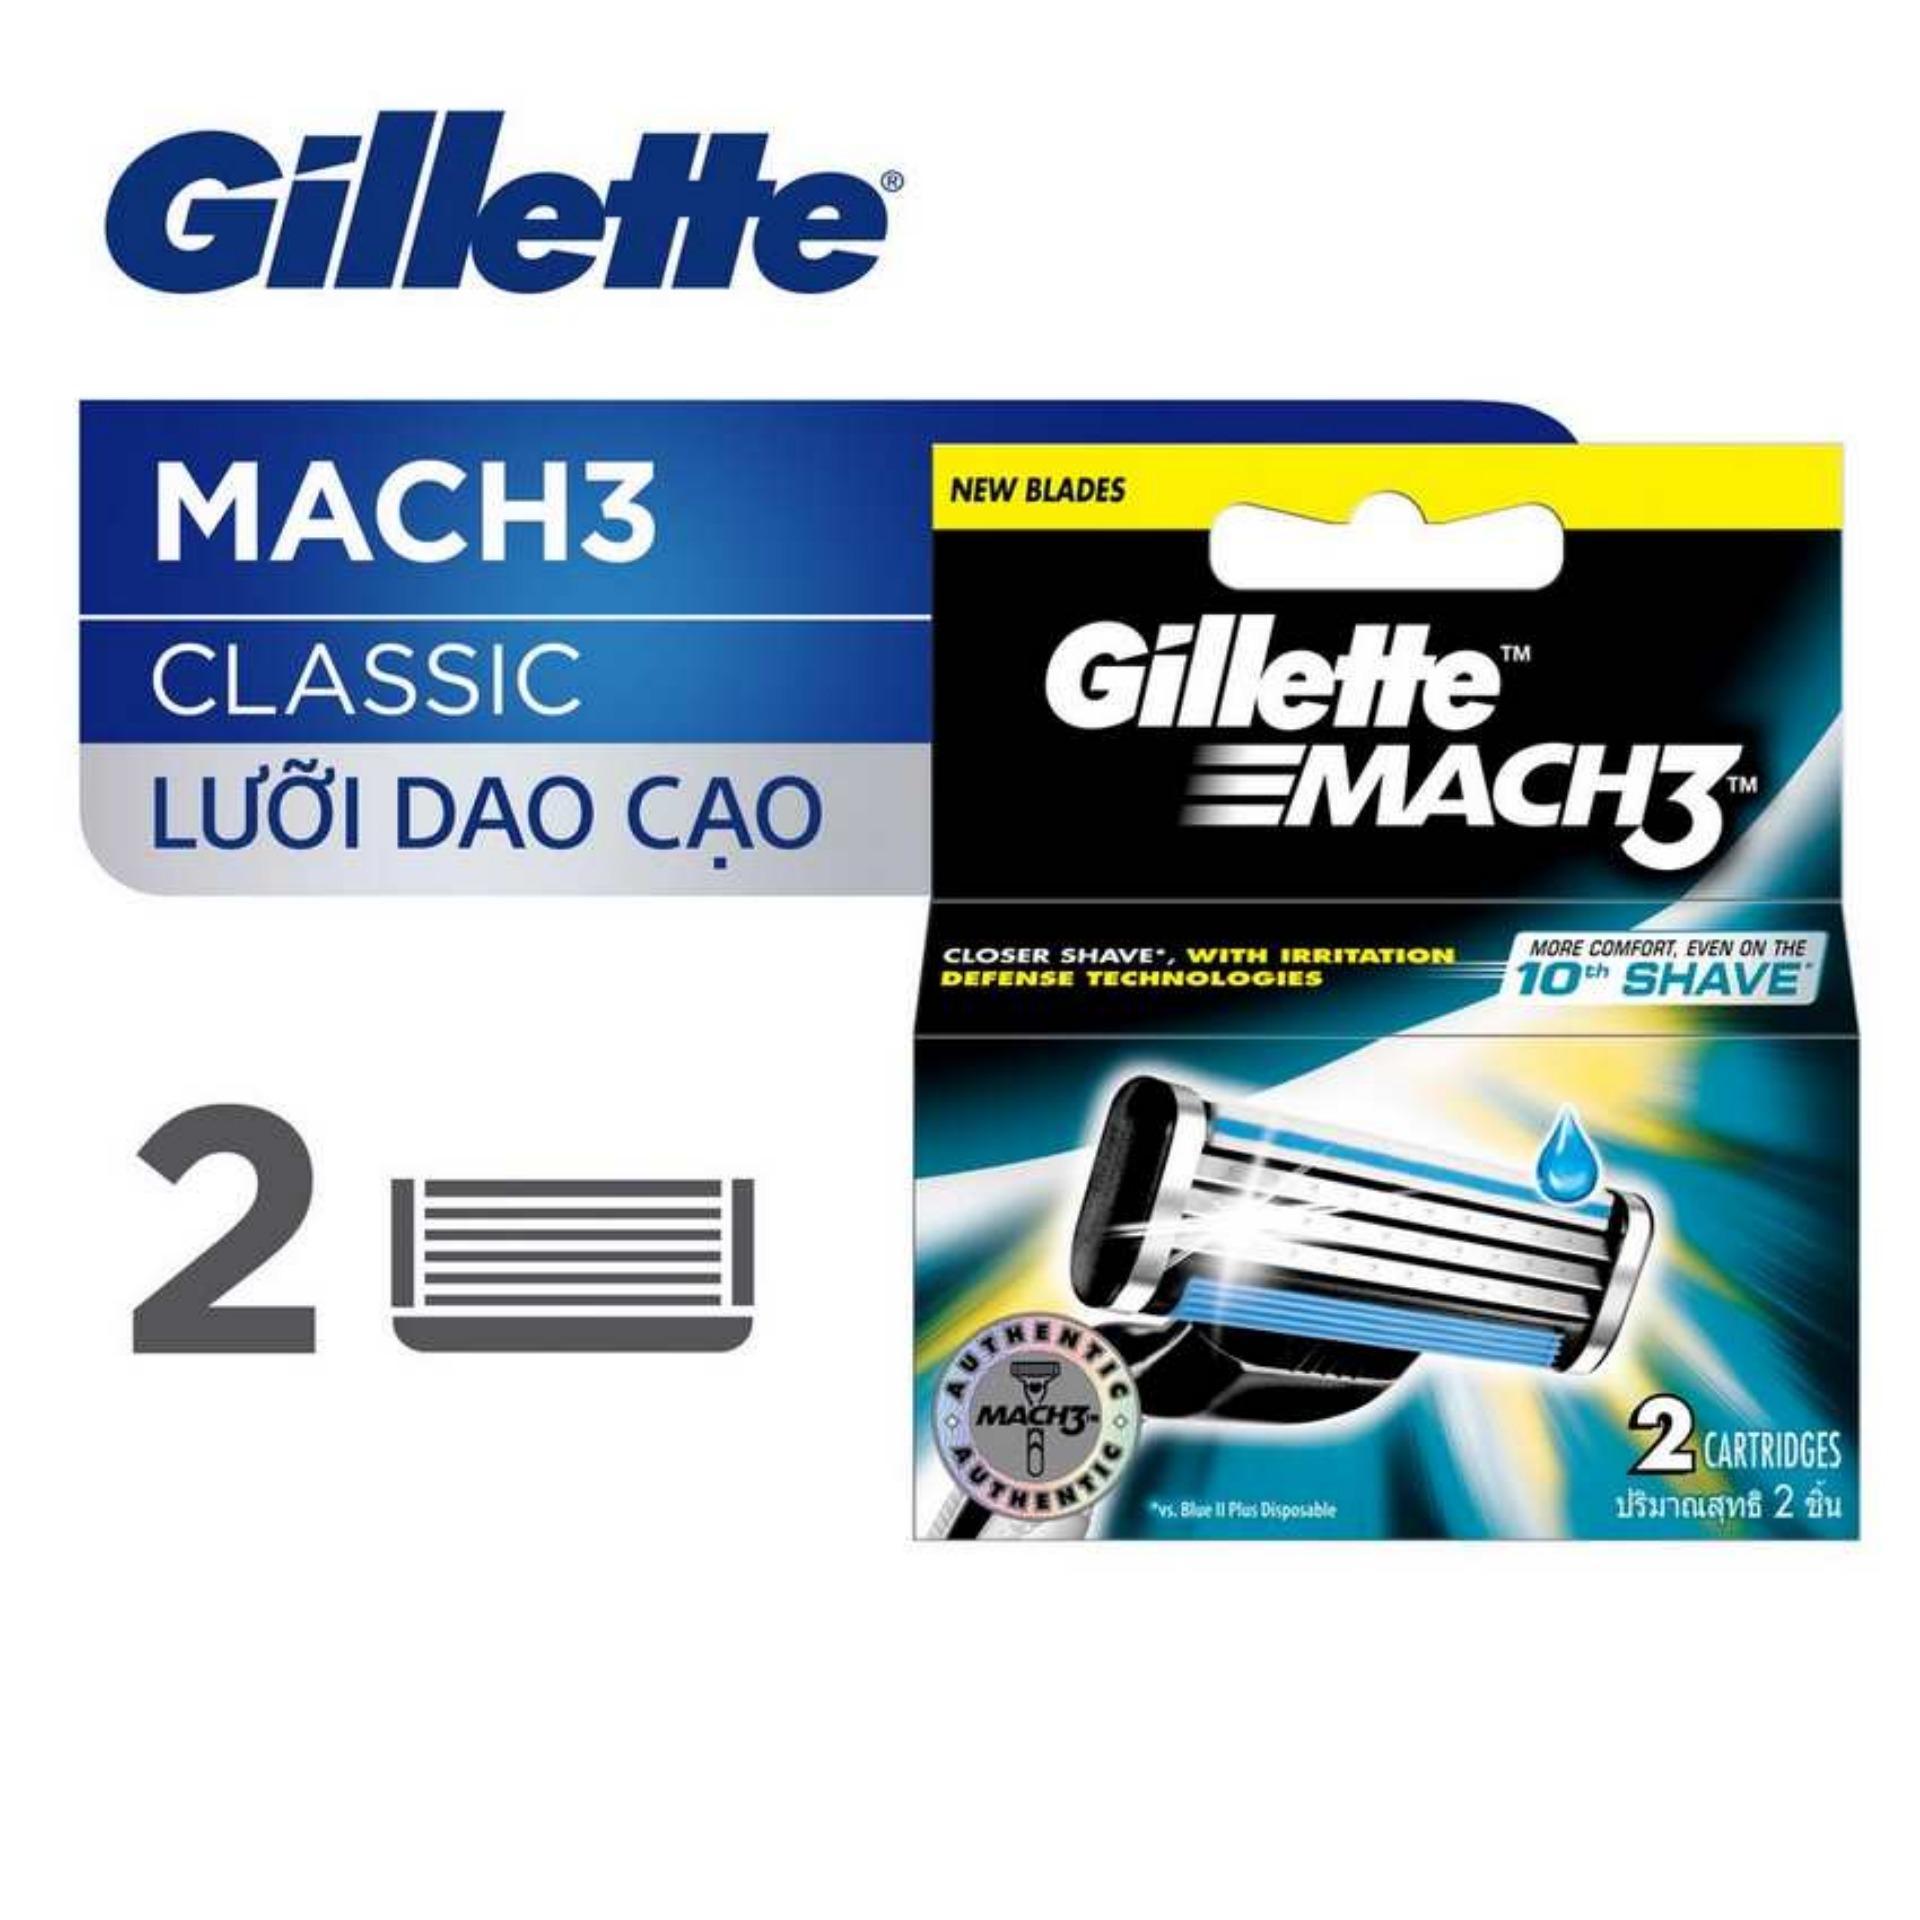 Lưỡi dao Gillette Mach3 vỉ 2 lưỡi - Classic vỉ 2s